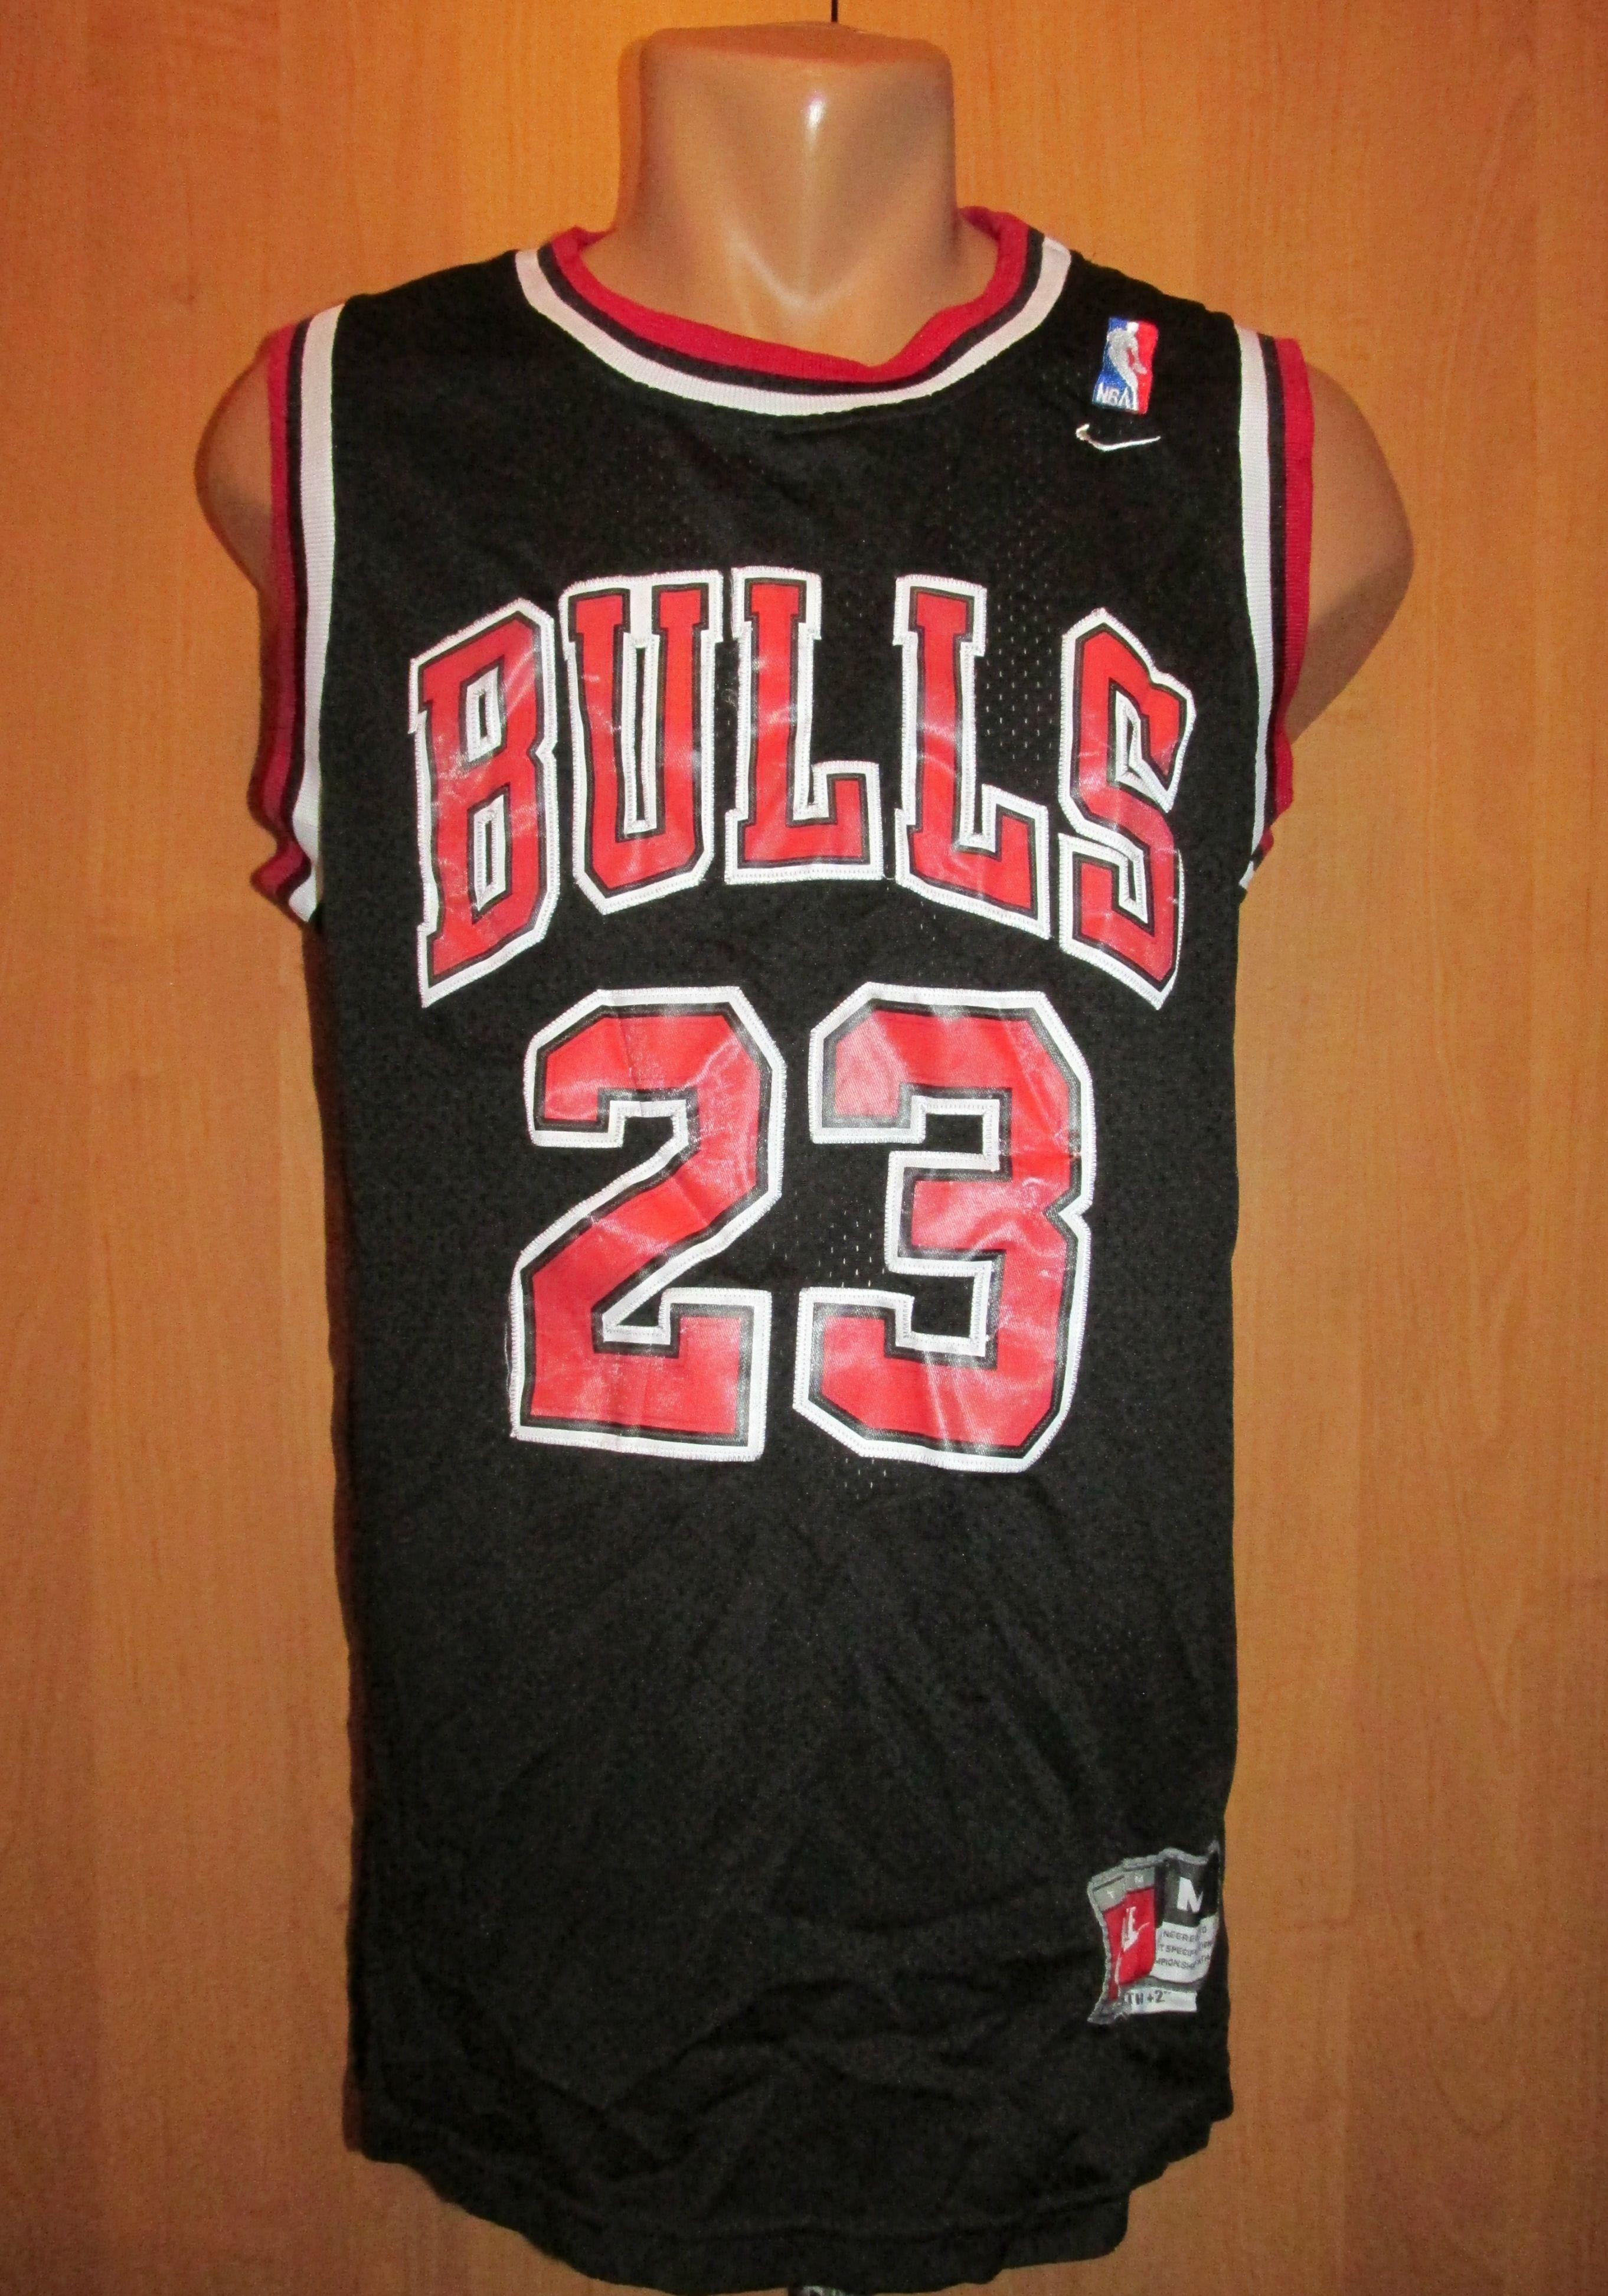 dbf611071e7 NBA Chicago Bulls Michaell Jordan #23 swingman basketball jersey by Nike  USA black basket #nba #chicago #bulls #chicagobulls #nike #jordan #jordan23  ...